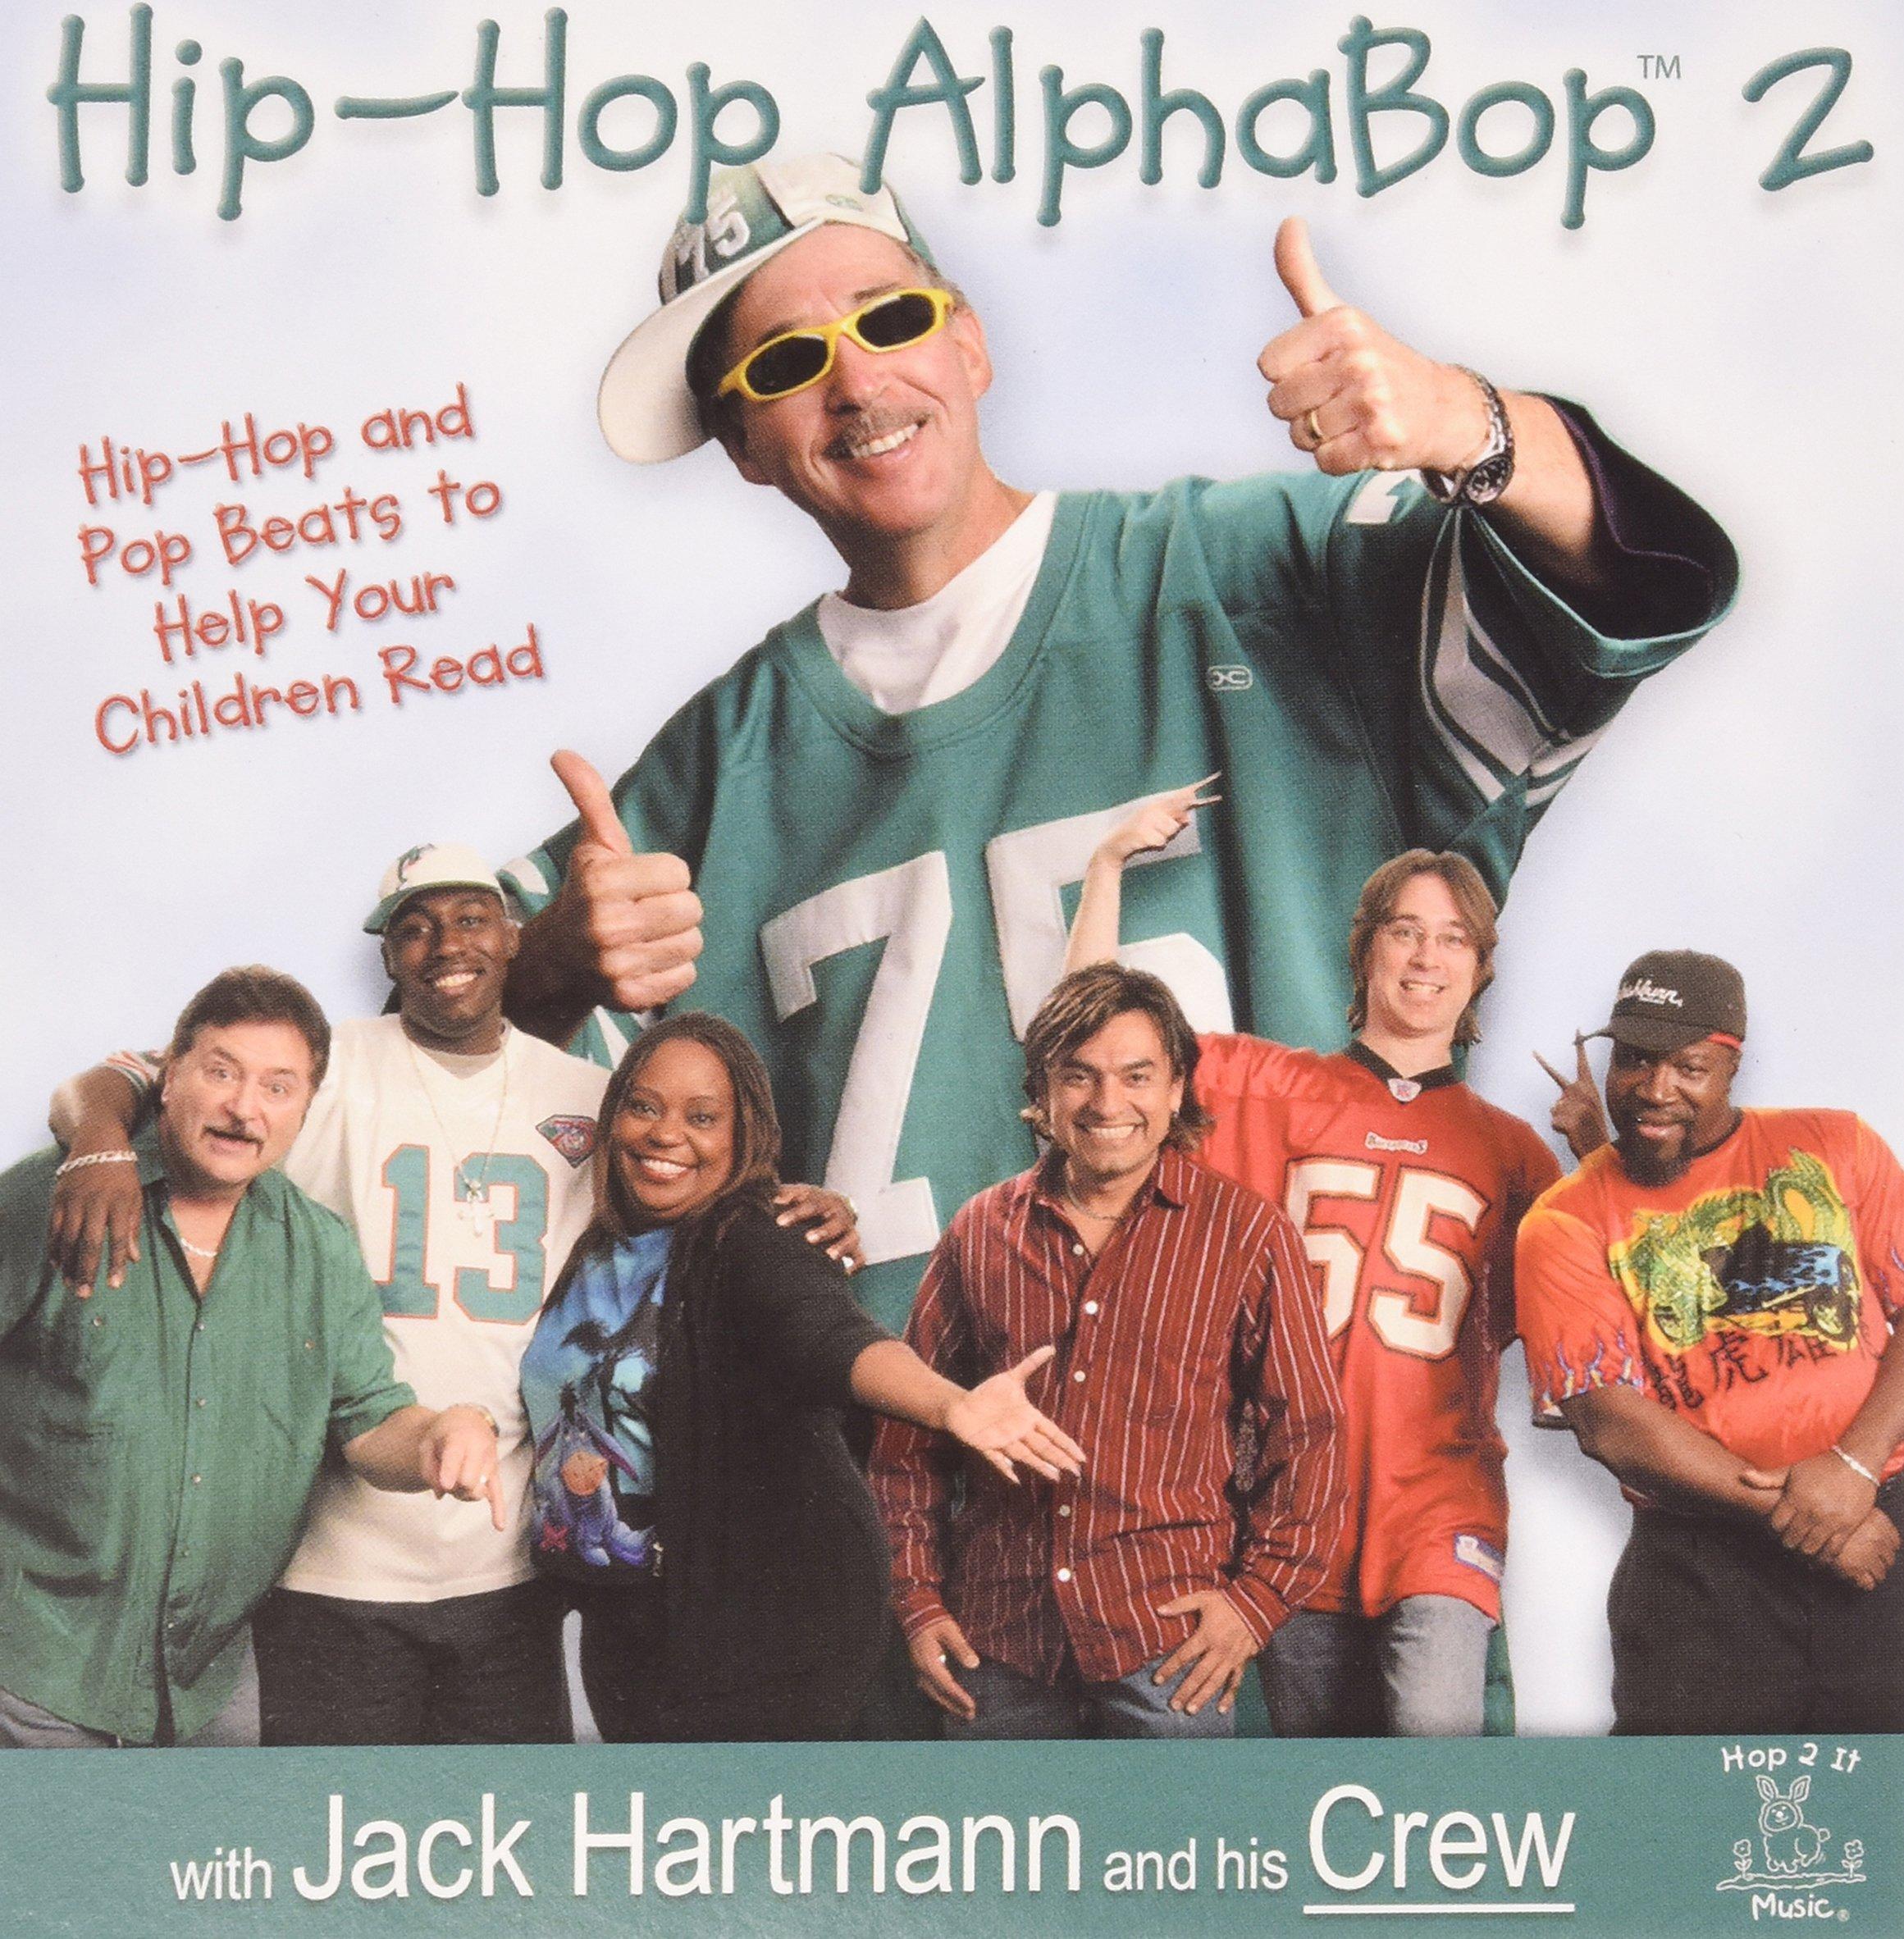 Hip-Hop Alphabop 2